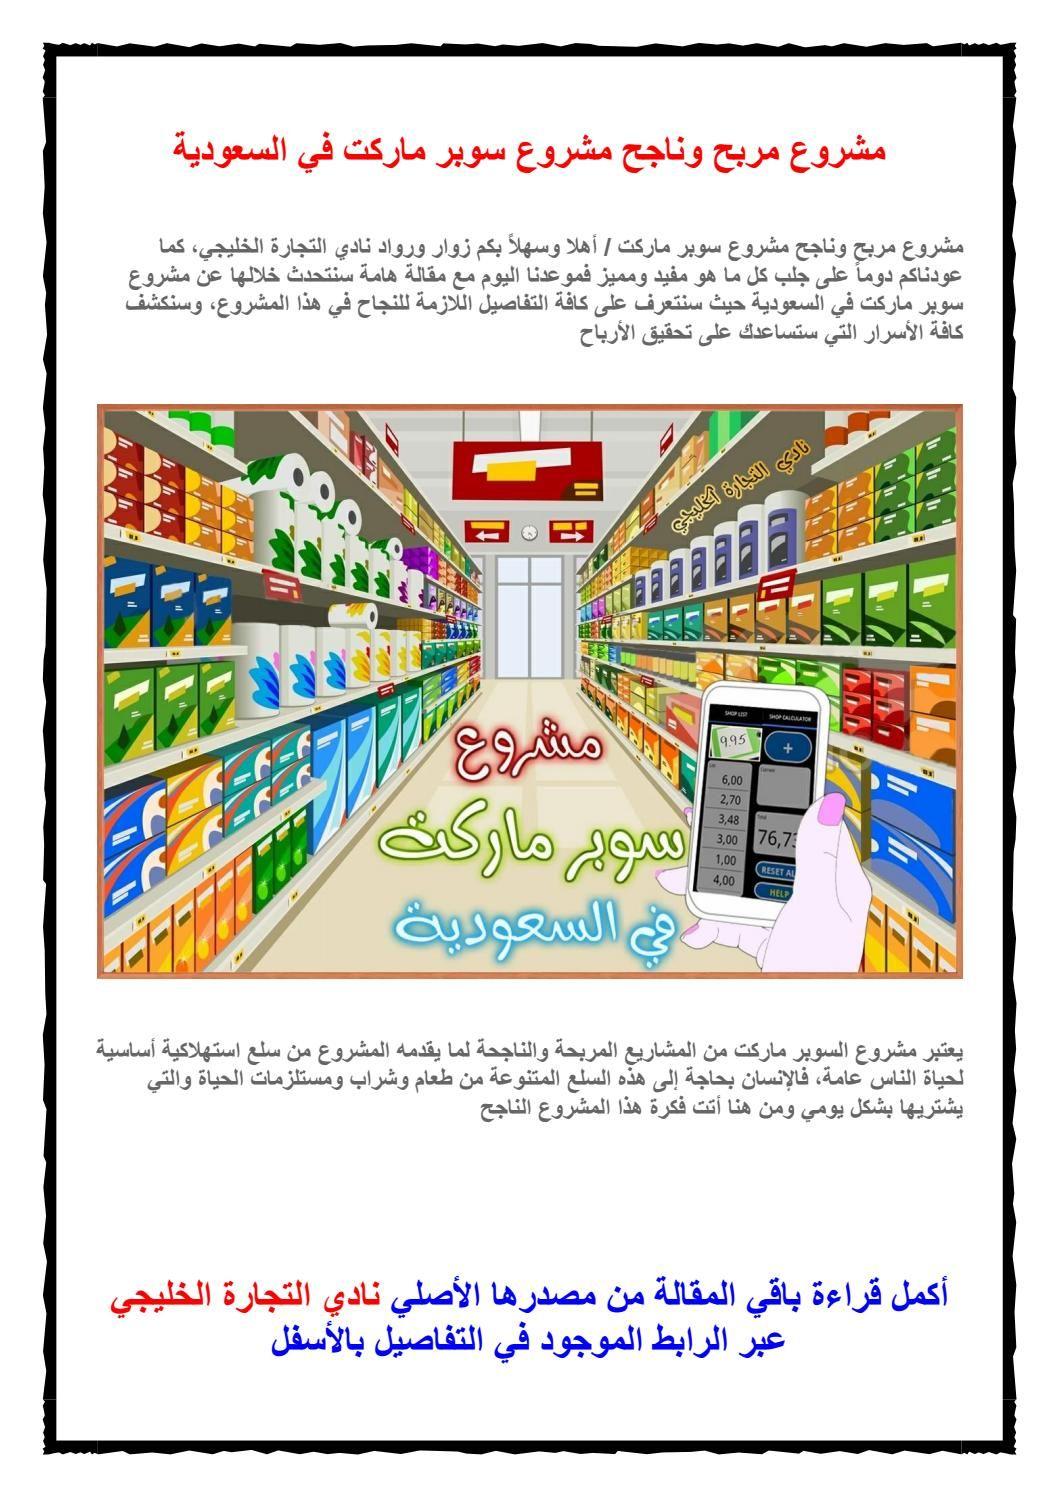 مشروع مربح وناجح مشروع سوبر ماركت في السعودية Monopoly Deal Monopoly Microsoft